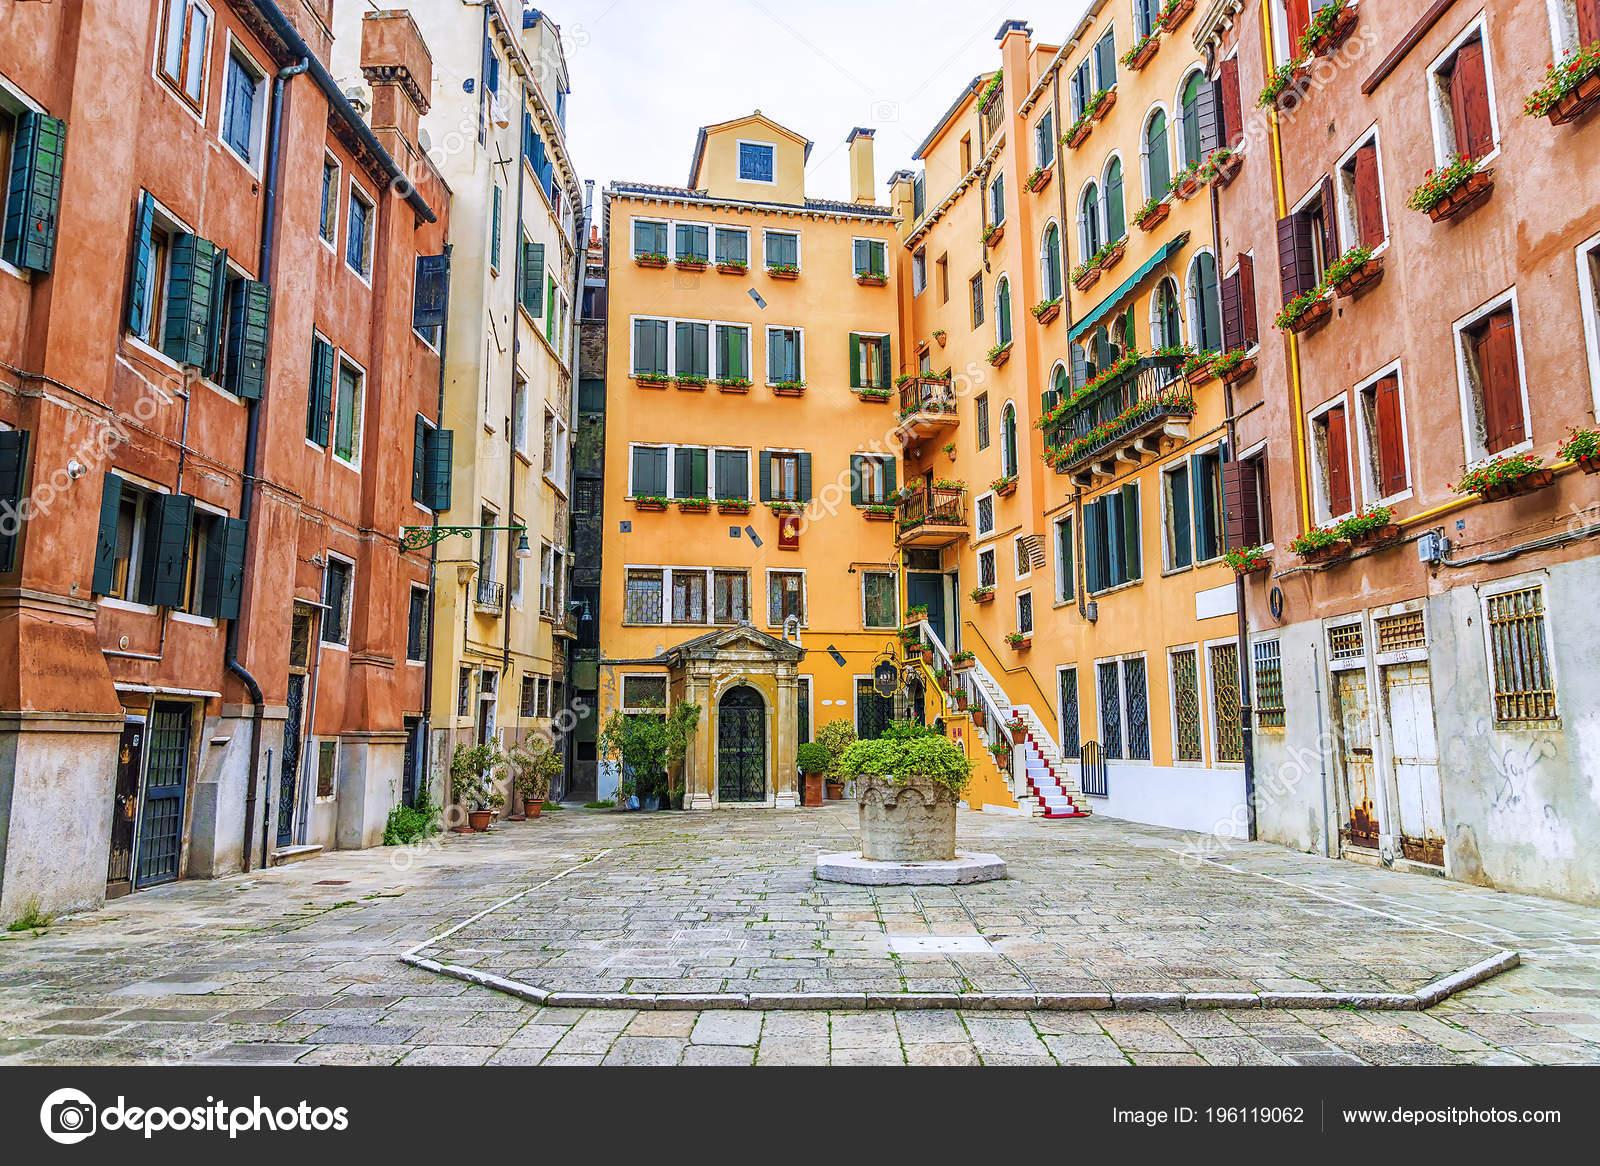 Courtyard Venice Italy Stock Photo C Deb 37 196119062